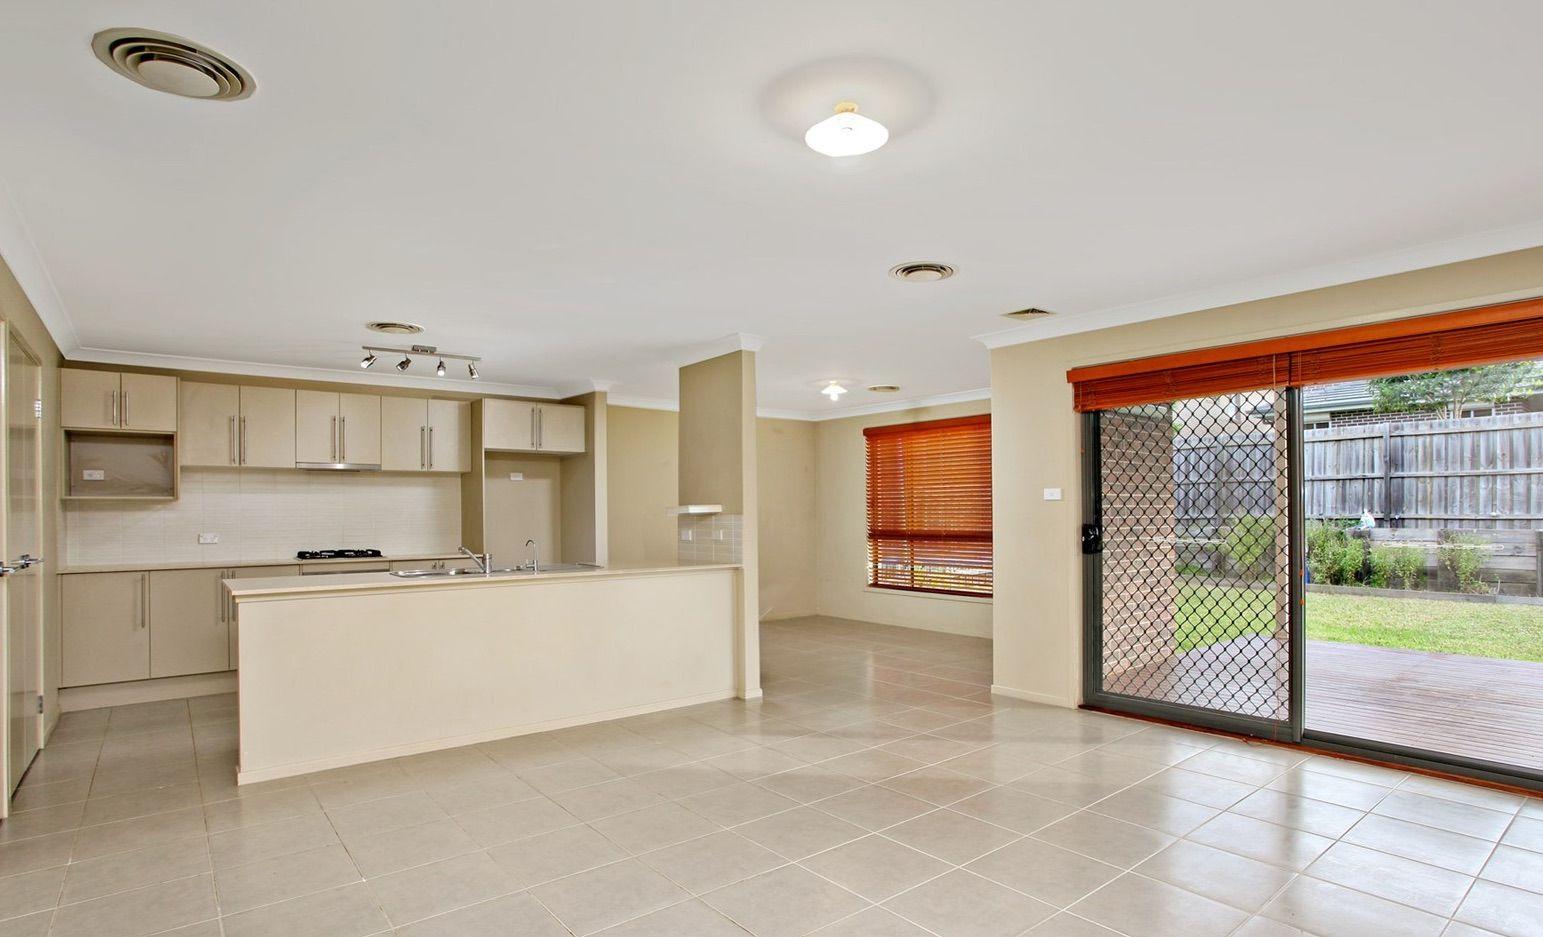 12 Allambie Street, The Ponds NSW 2769, Image 2